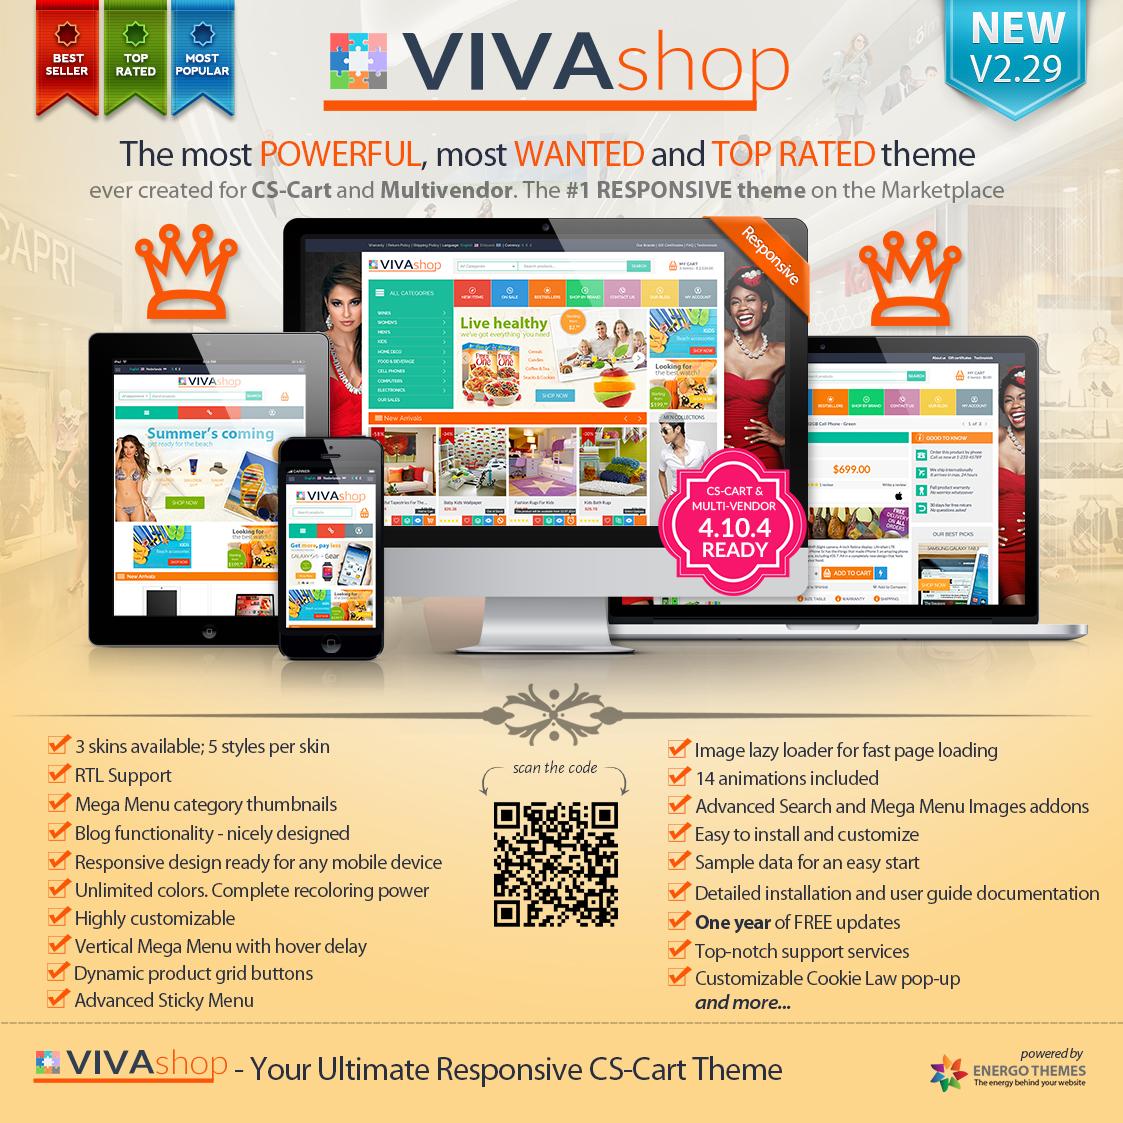 VIVAshop-V2.29-presentation-page-MP.jpg